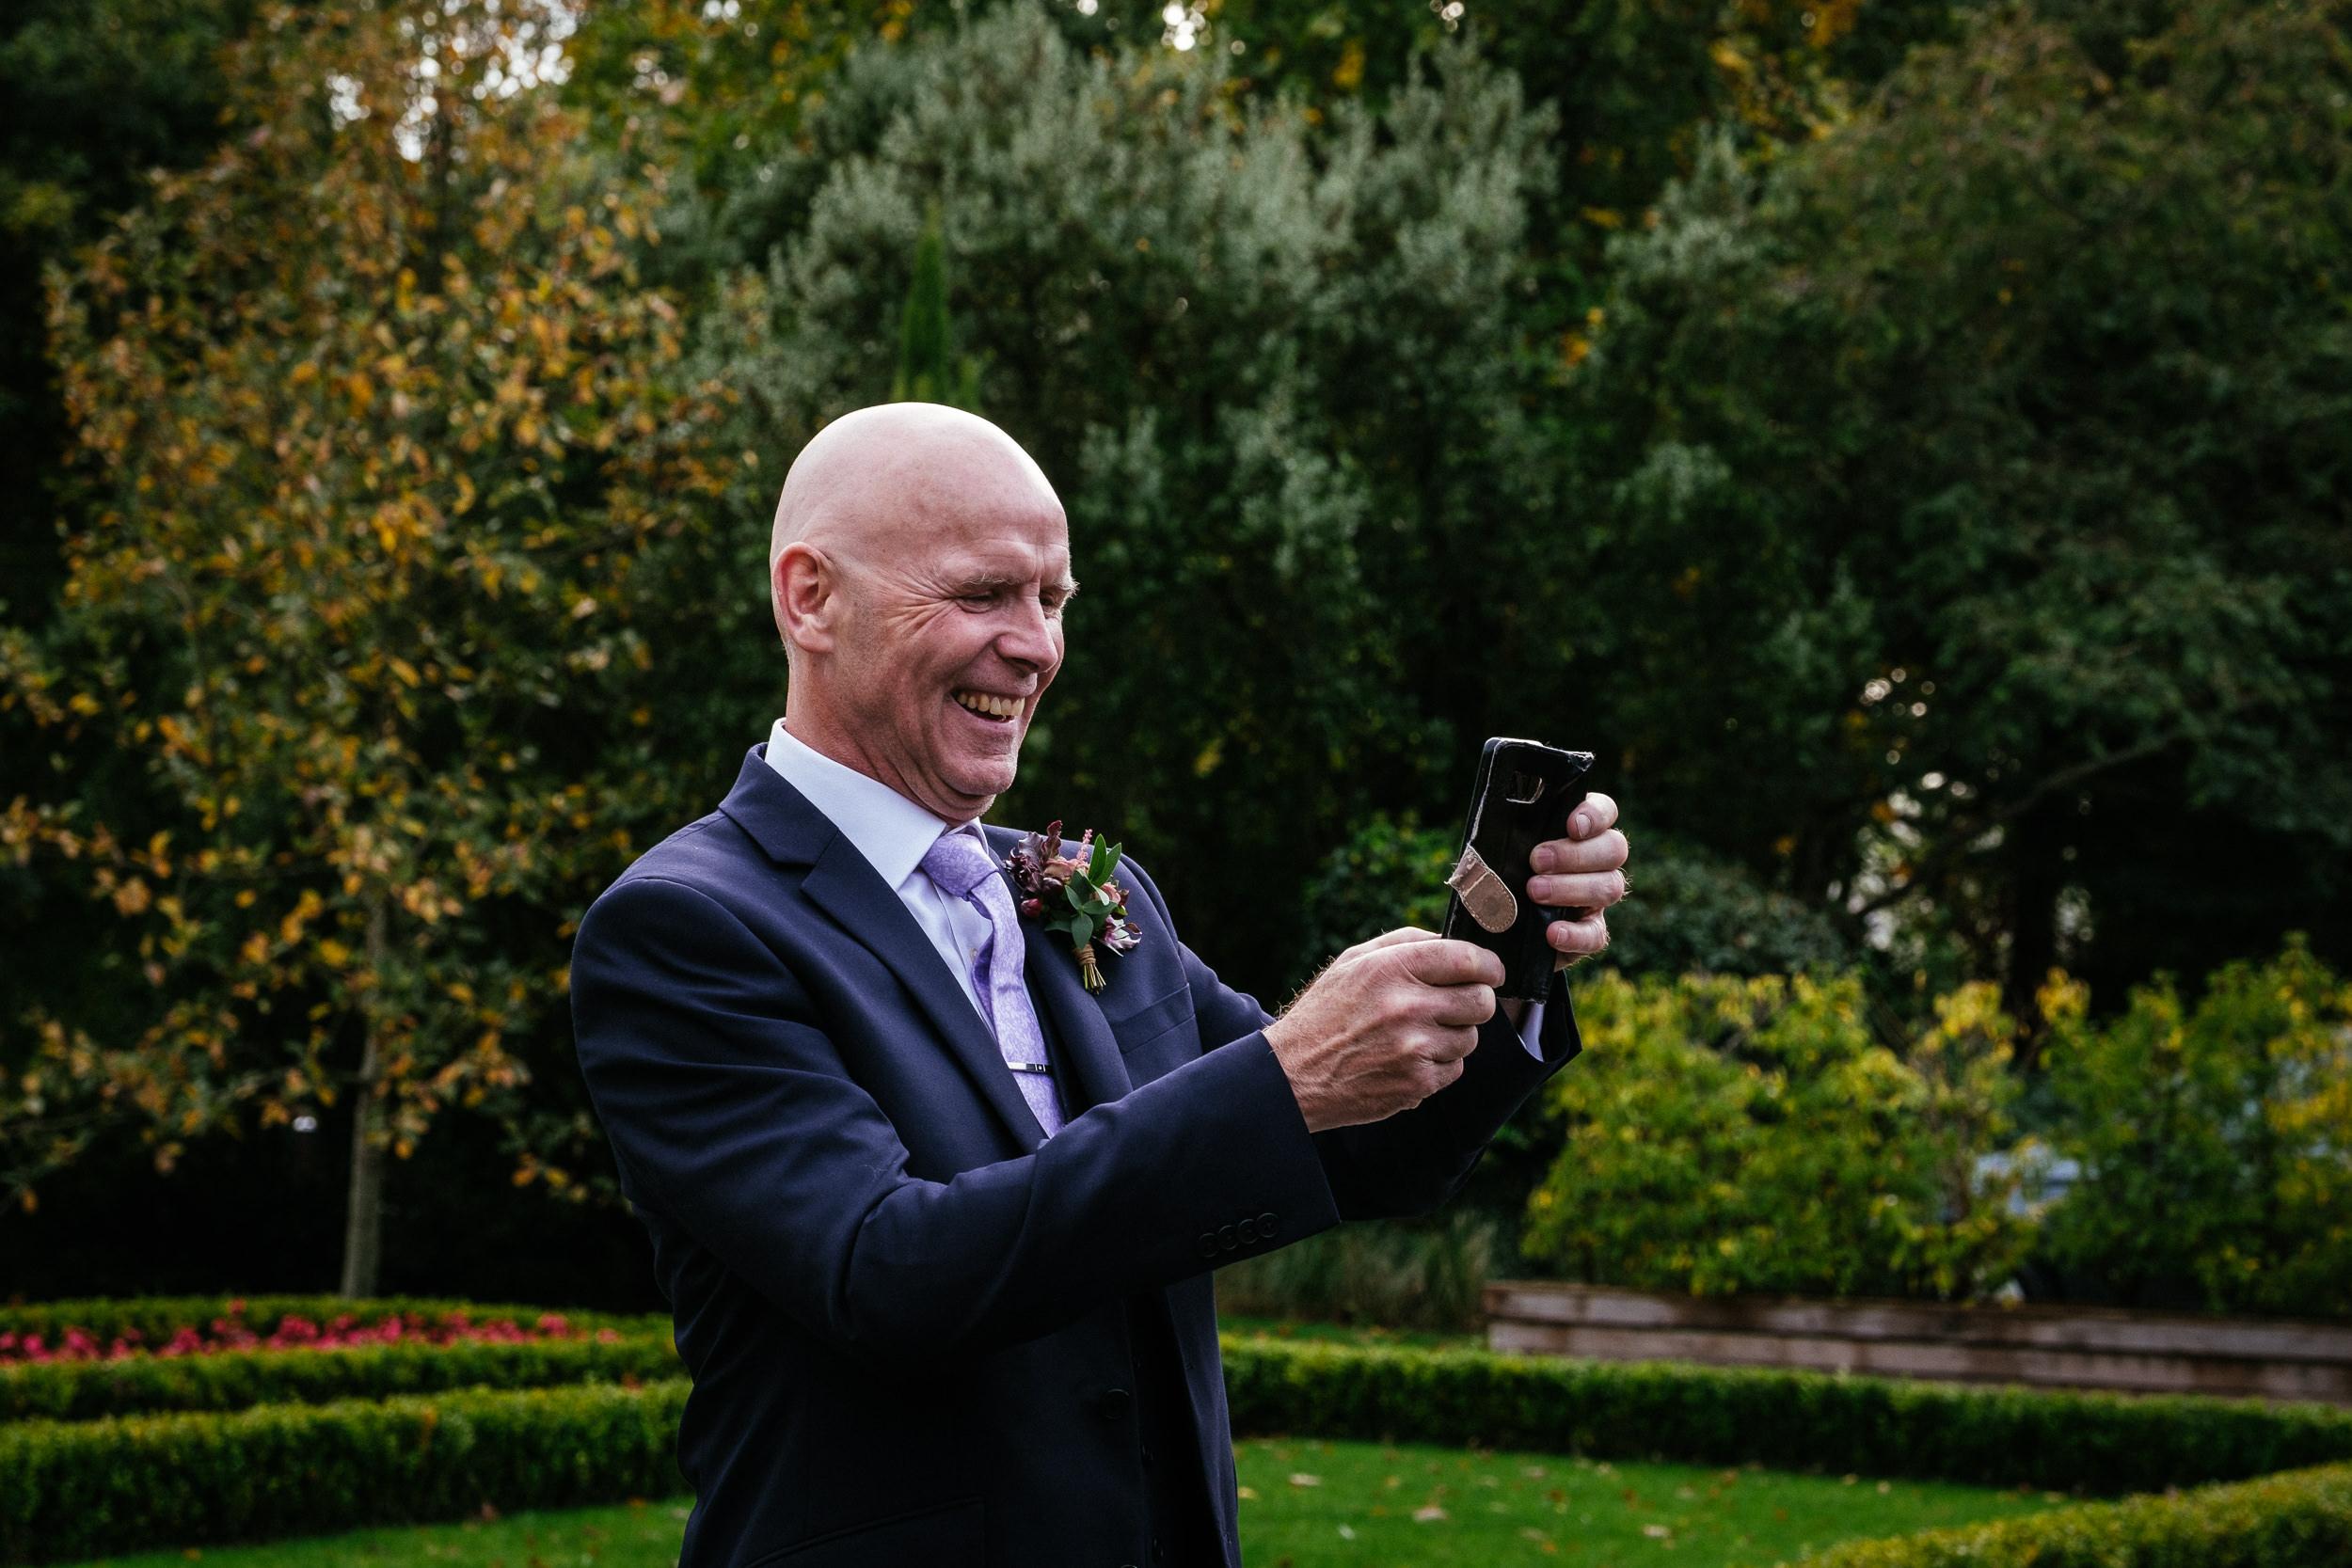 tinakilly house Wedding Photographer080